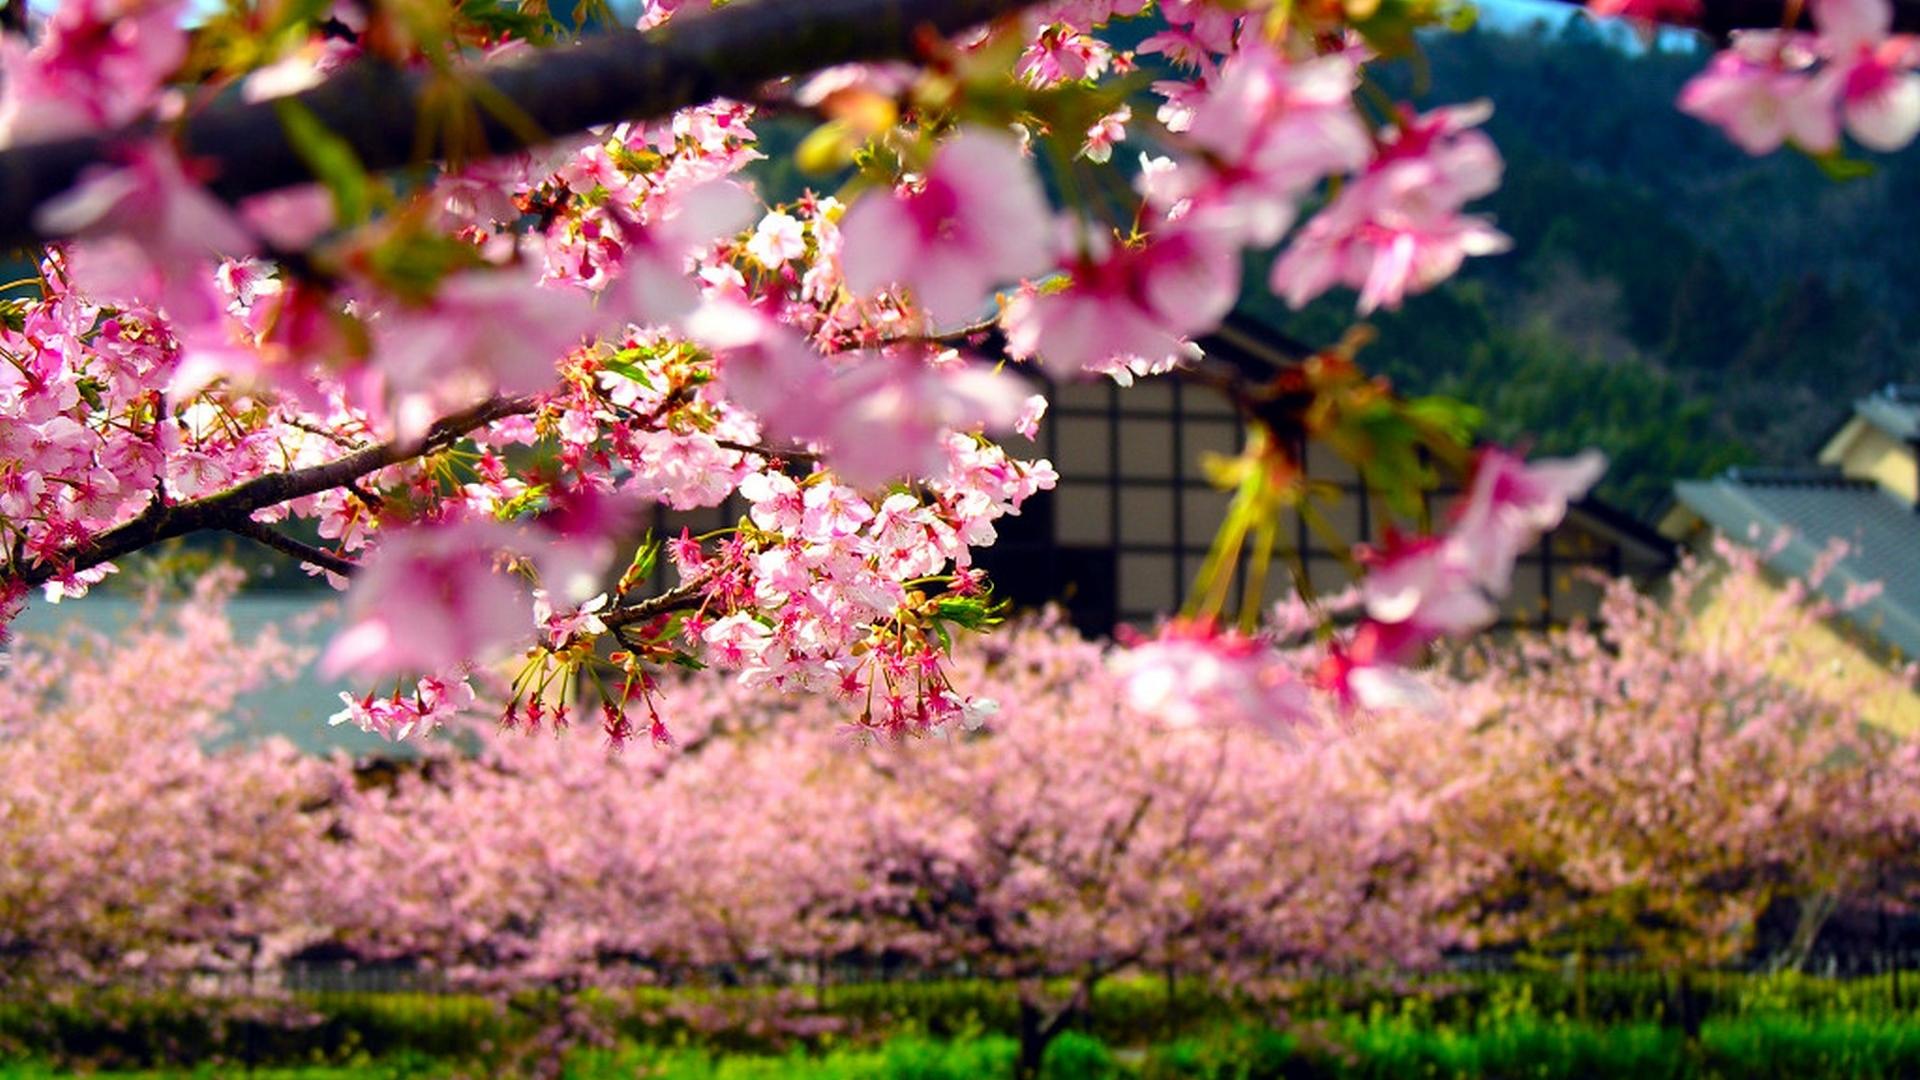 1080p-HD-Japan-Wallpapers